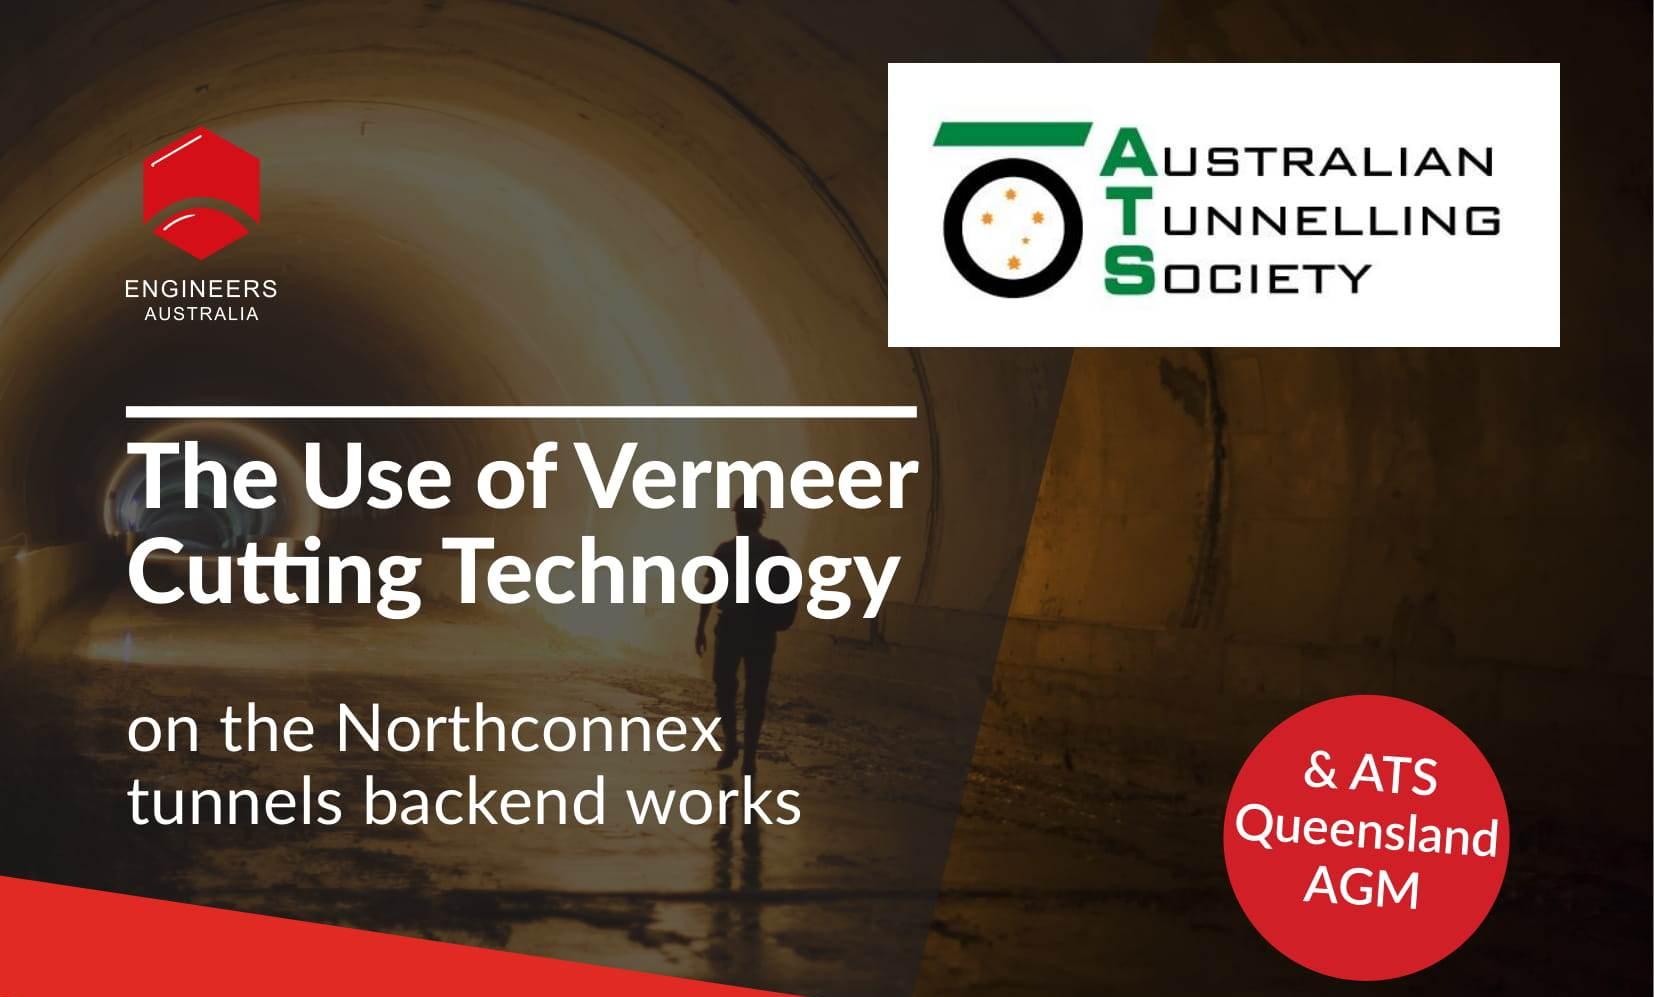 vermeer-cutting-technology-flyer-dm-edit-1